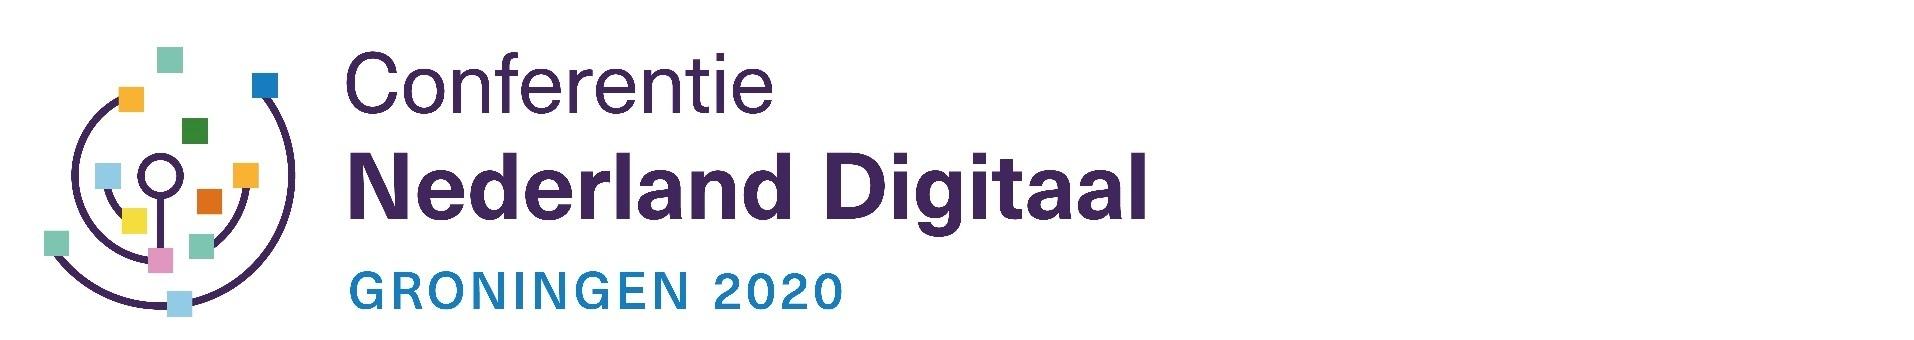 Conferentie Nederland Digitaal